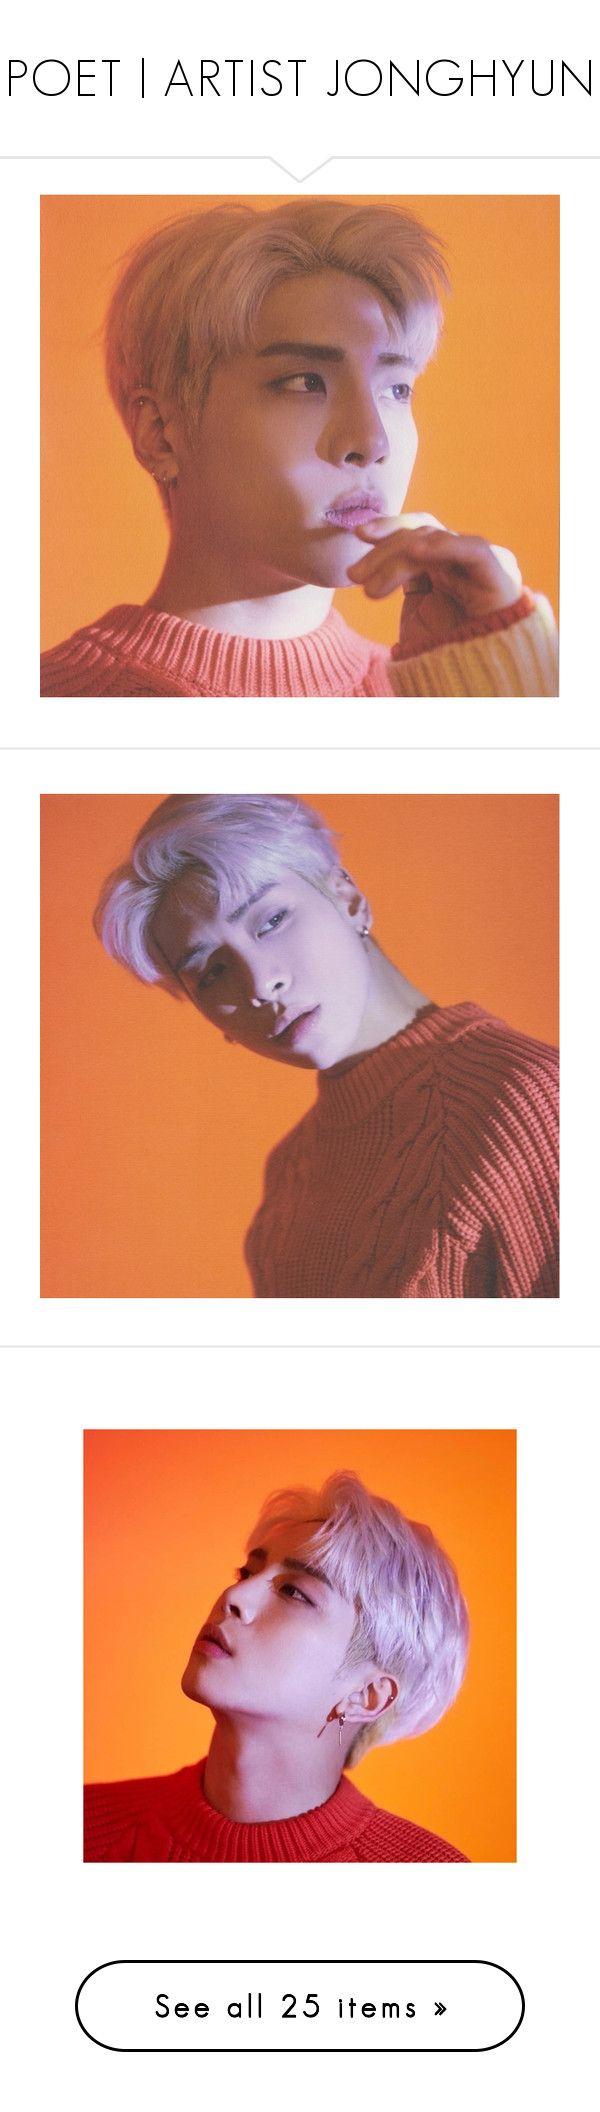 """POET | ARTIST JONGHYUN"" by sxoultrip ❤ liked on Polyvore featuring kpop, shinee, jonghyun, shinin, outerwear and coats"